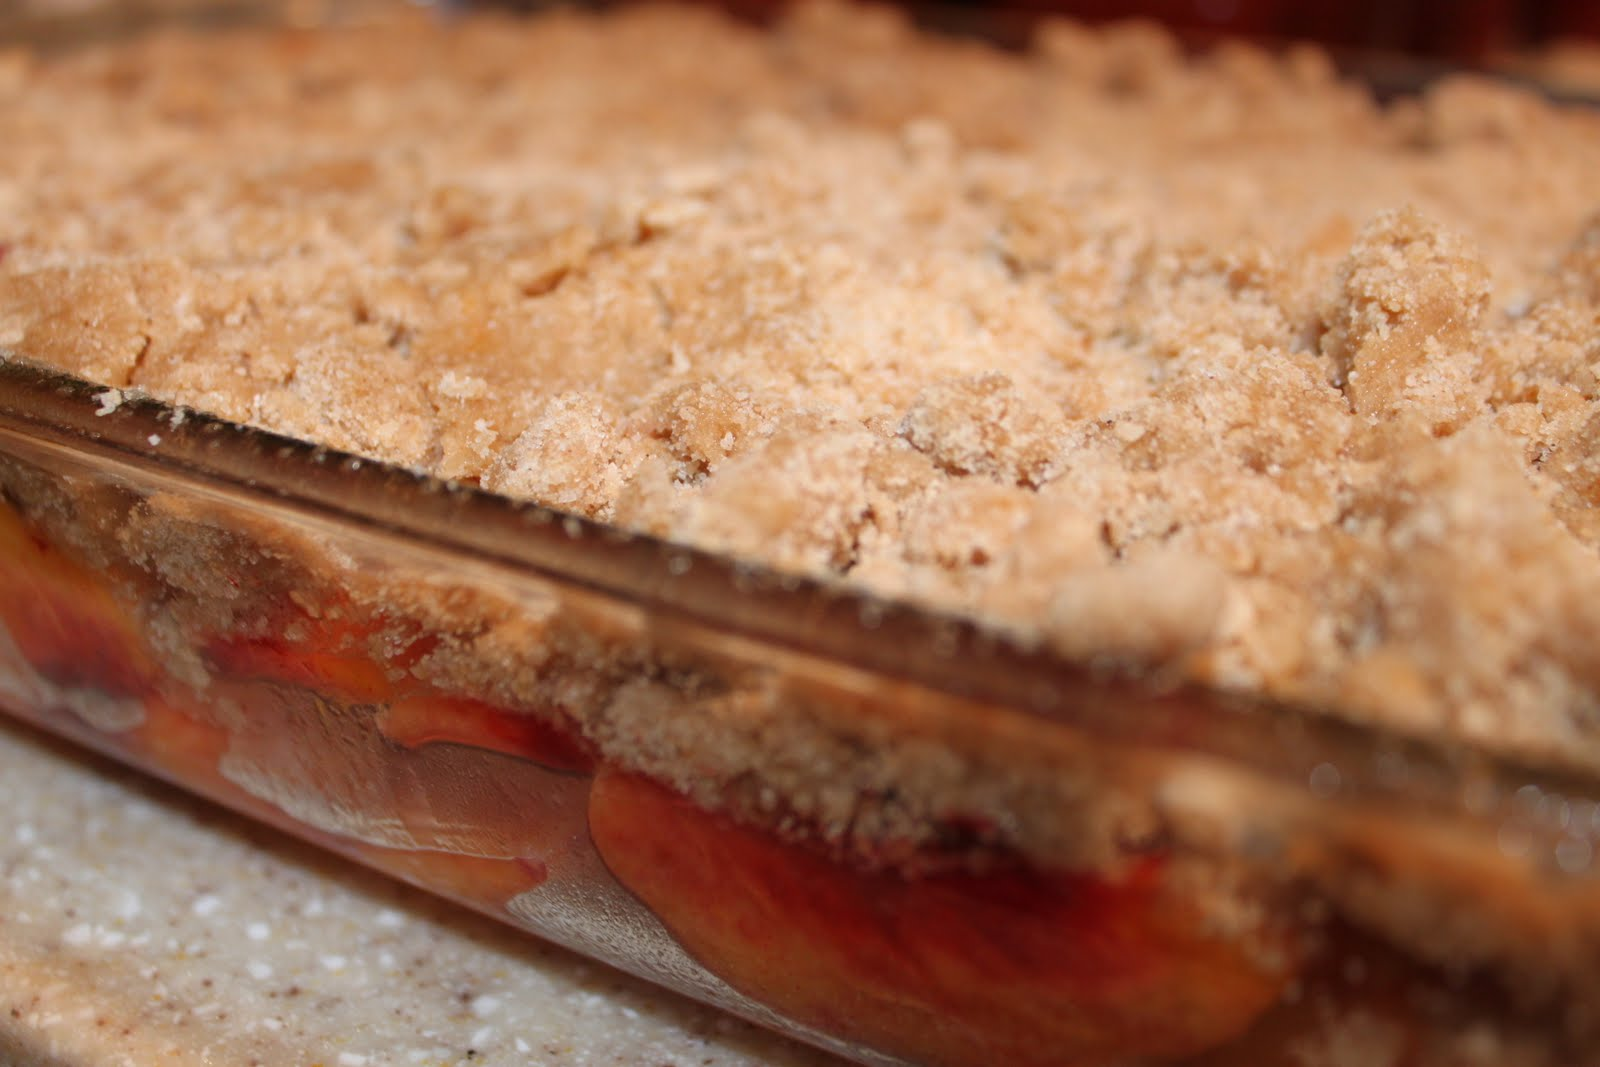 Peach Crisp With Maple Cream Sauce - 2 Maids a Baking ...